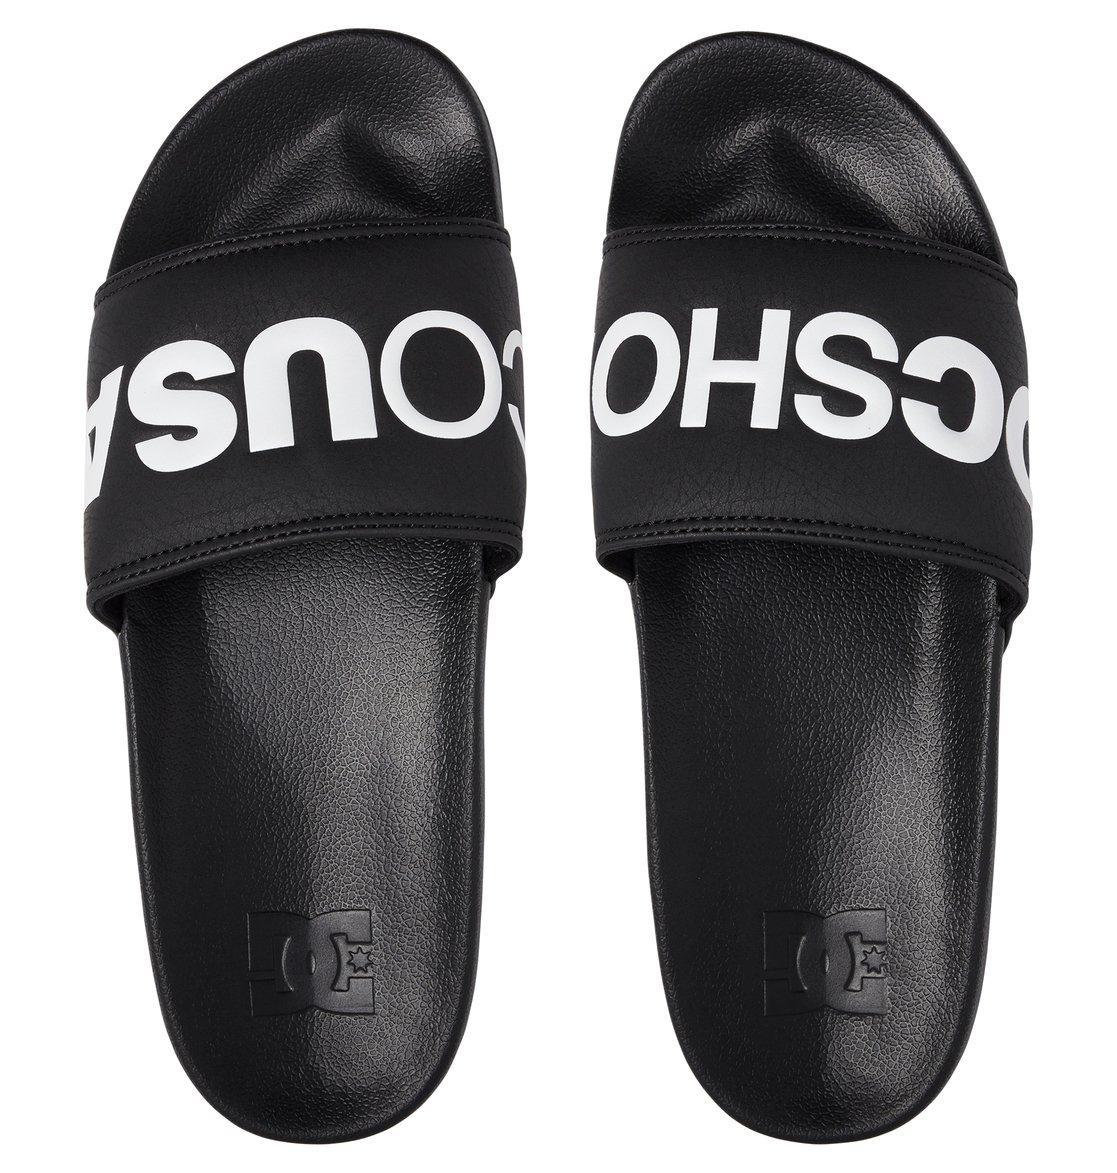 Mens Black And White Slip On Shoes